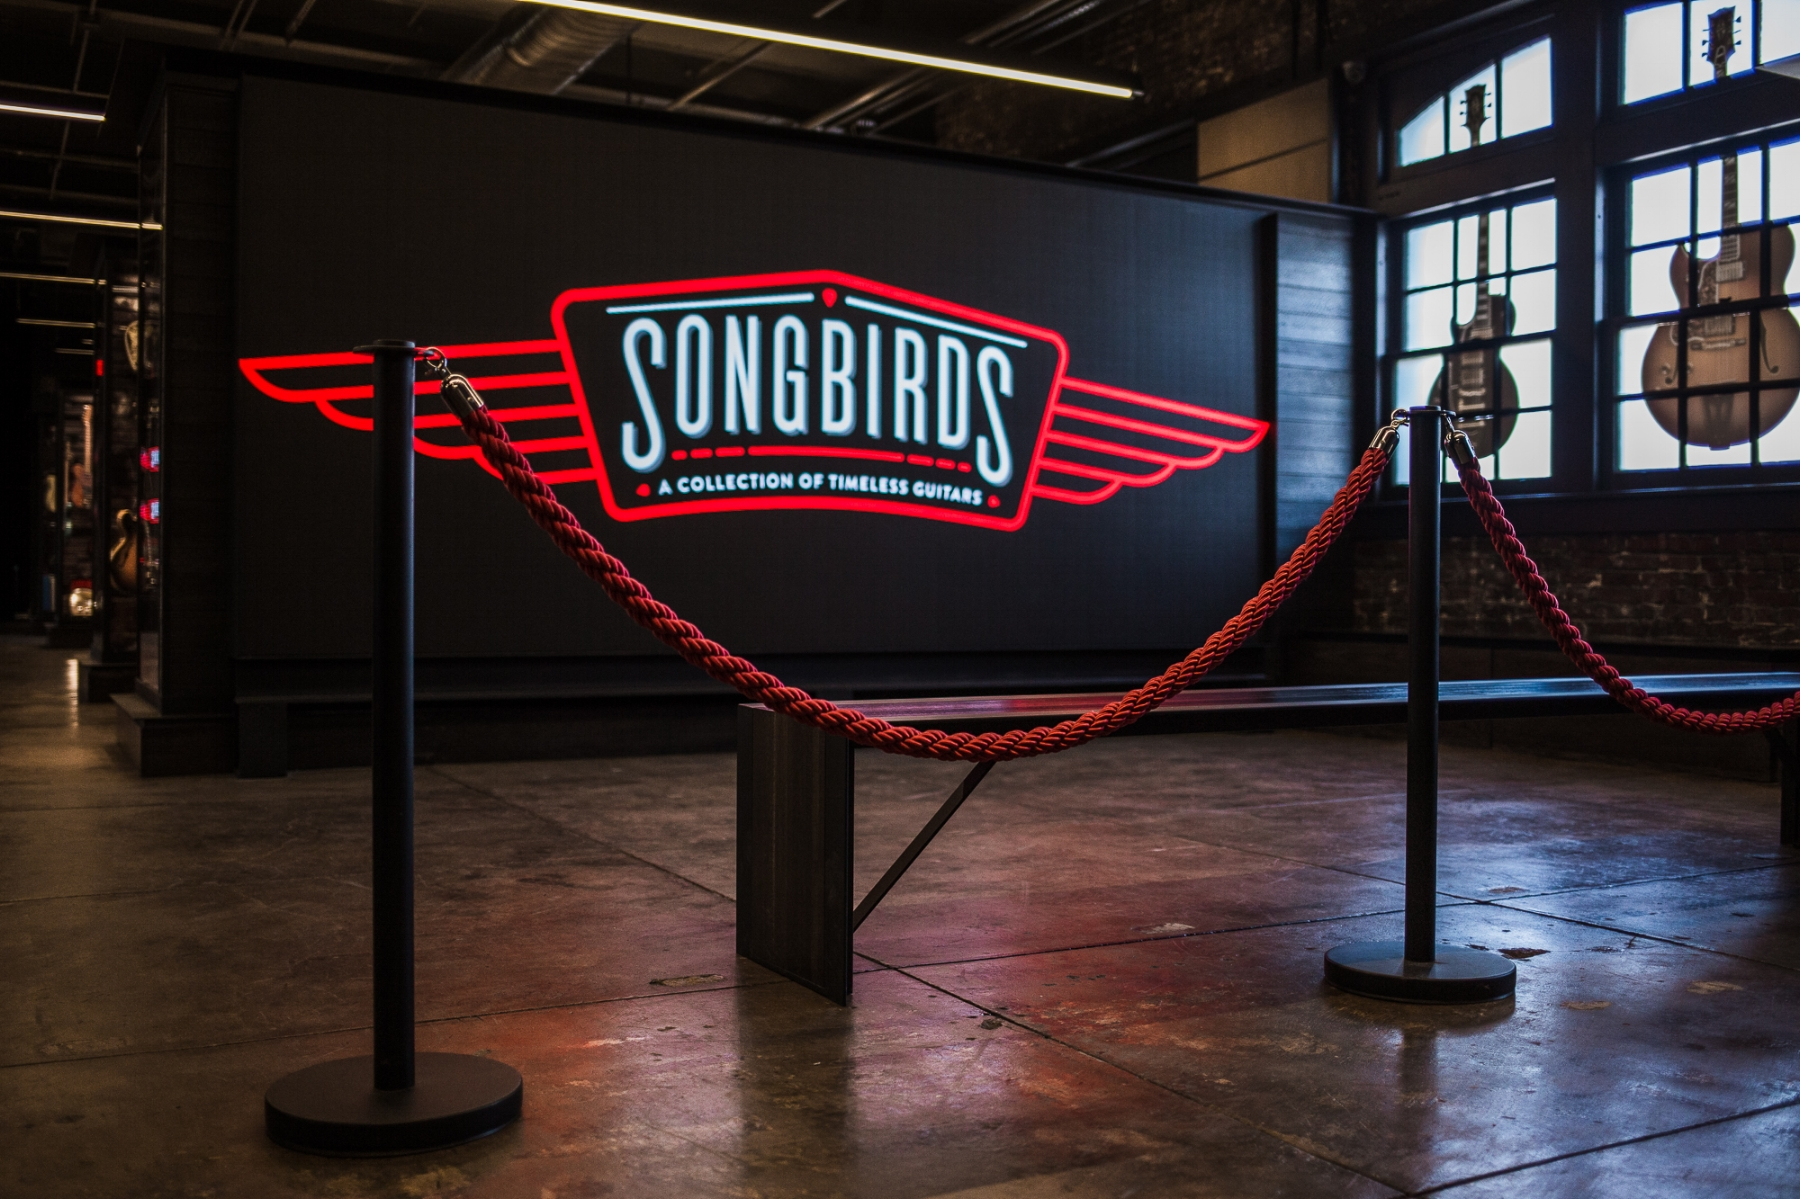 Songbirds-1.jpg